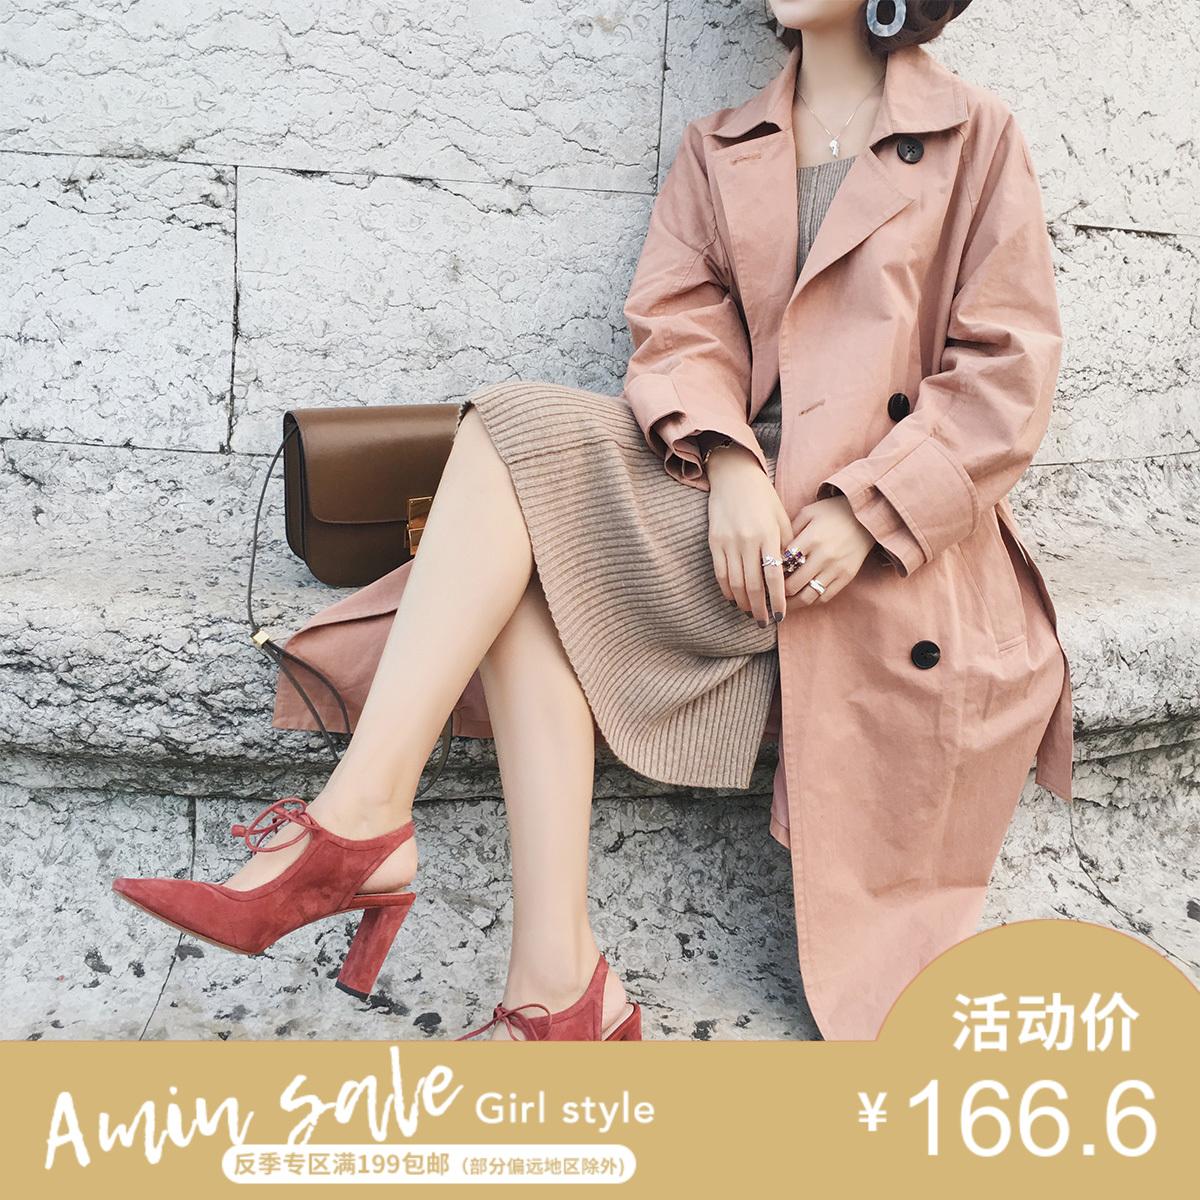 【AMIU_反季购】滕雨佳 SHOCK AMIU 2017年春秋女装中长款风衣